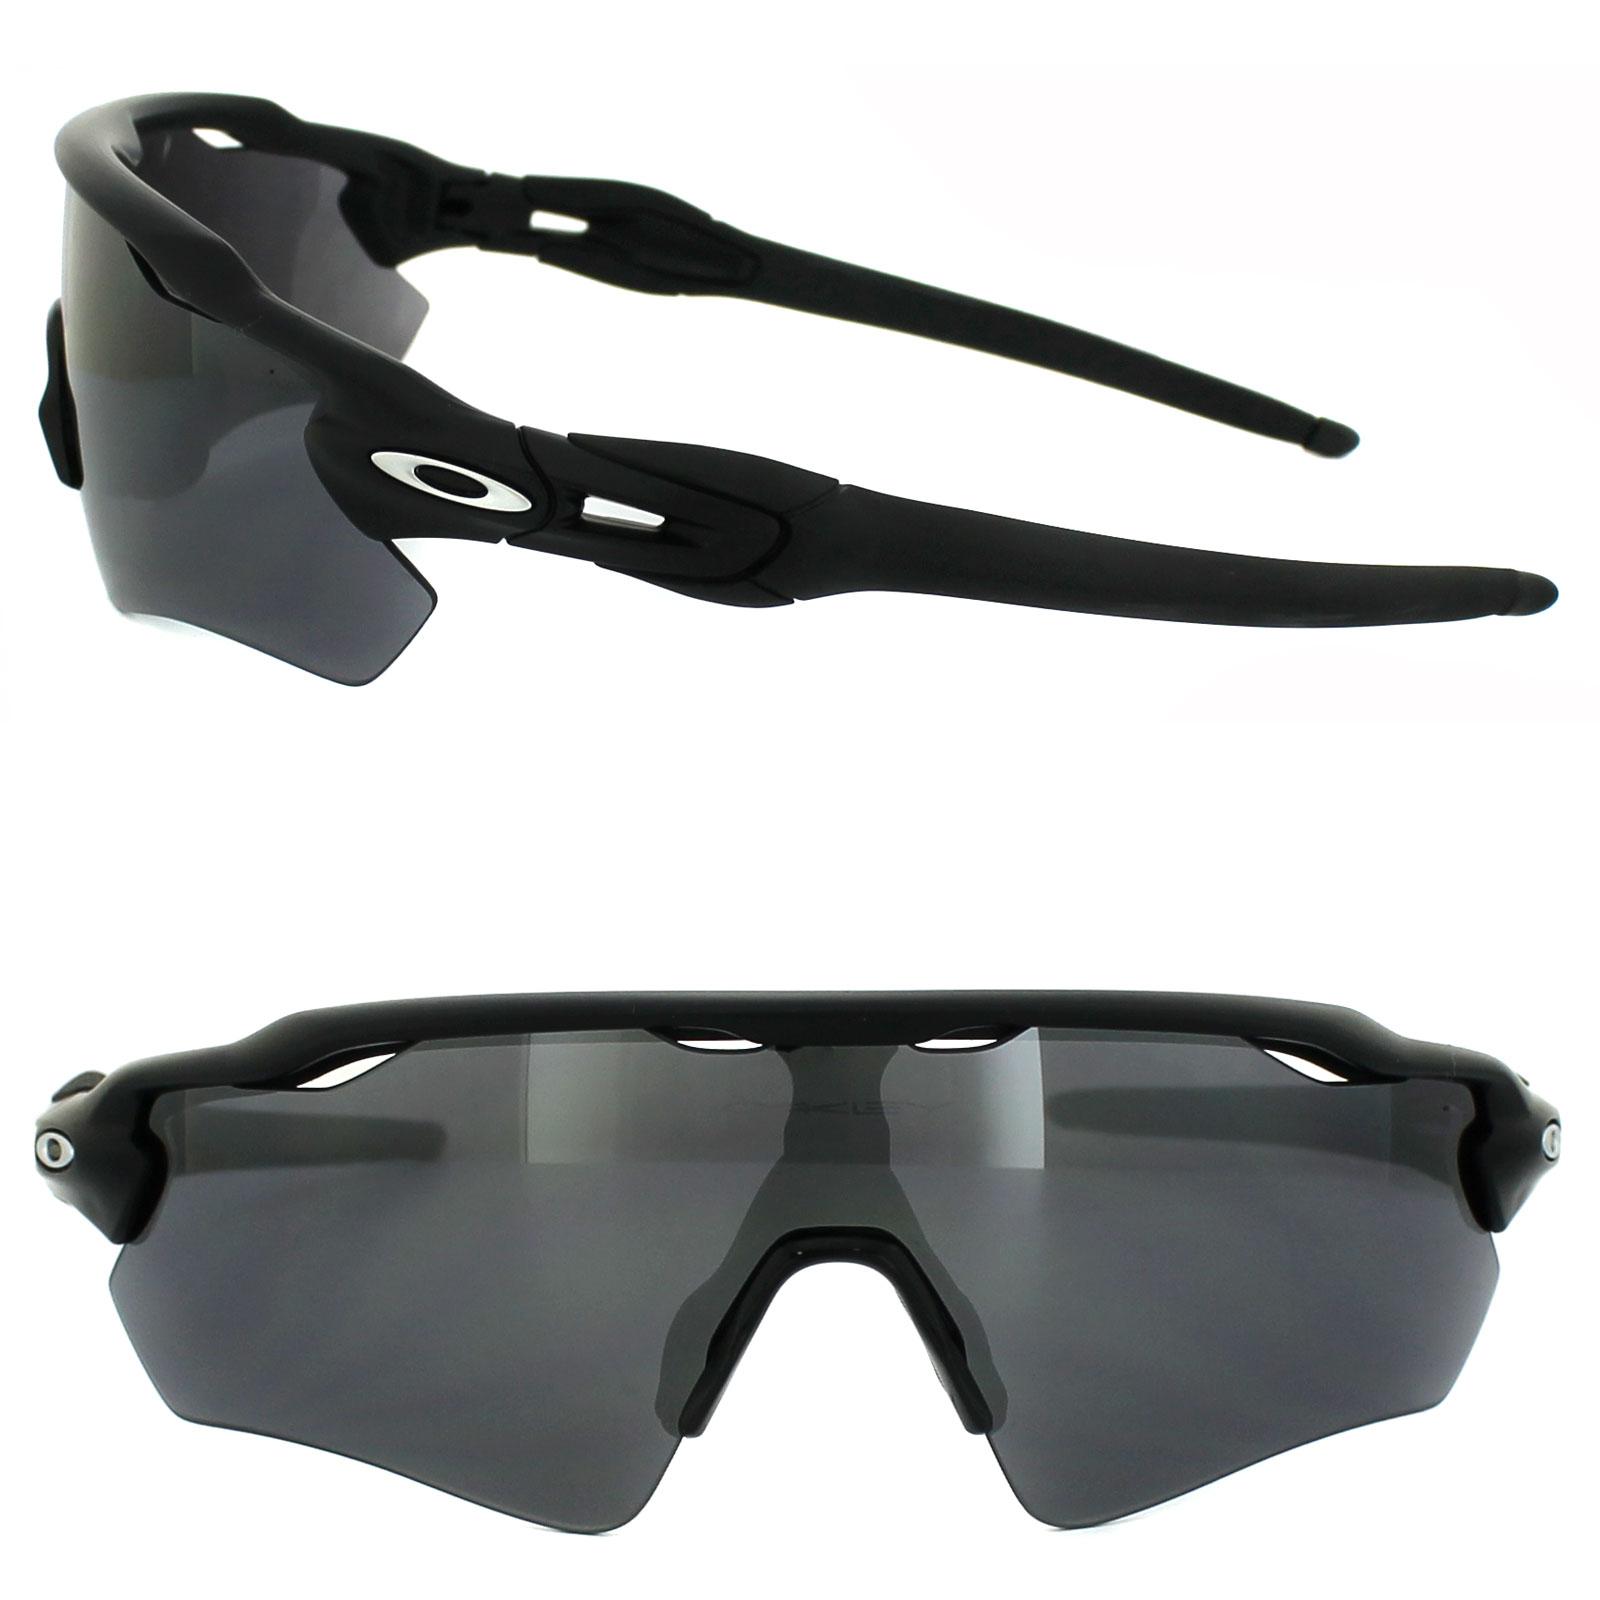 ab78797ace Oakley Sunglasses Radar EV Path OO9208-01 Matt Black Black Iridium